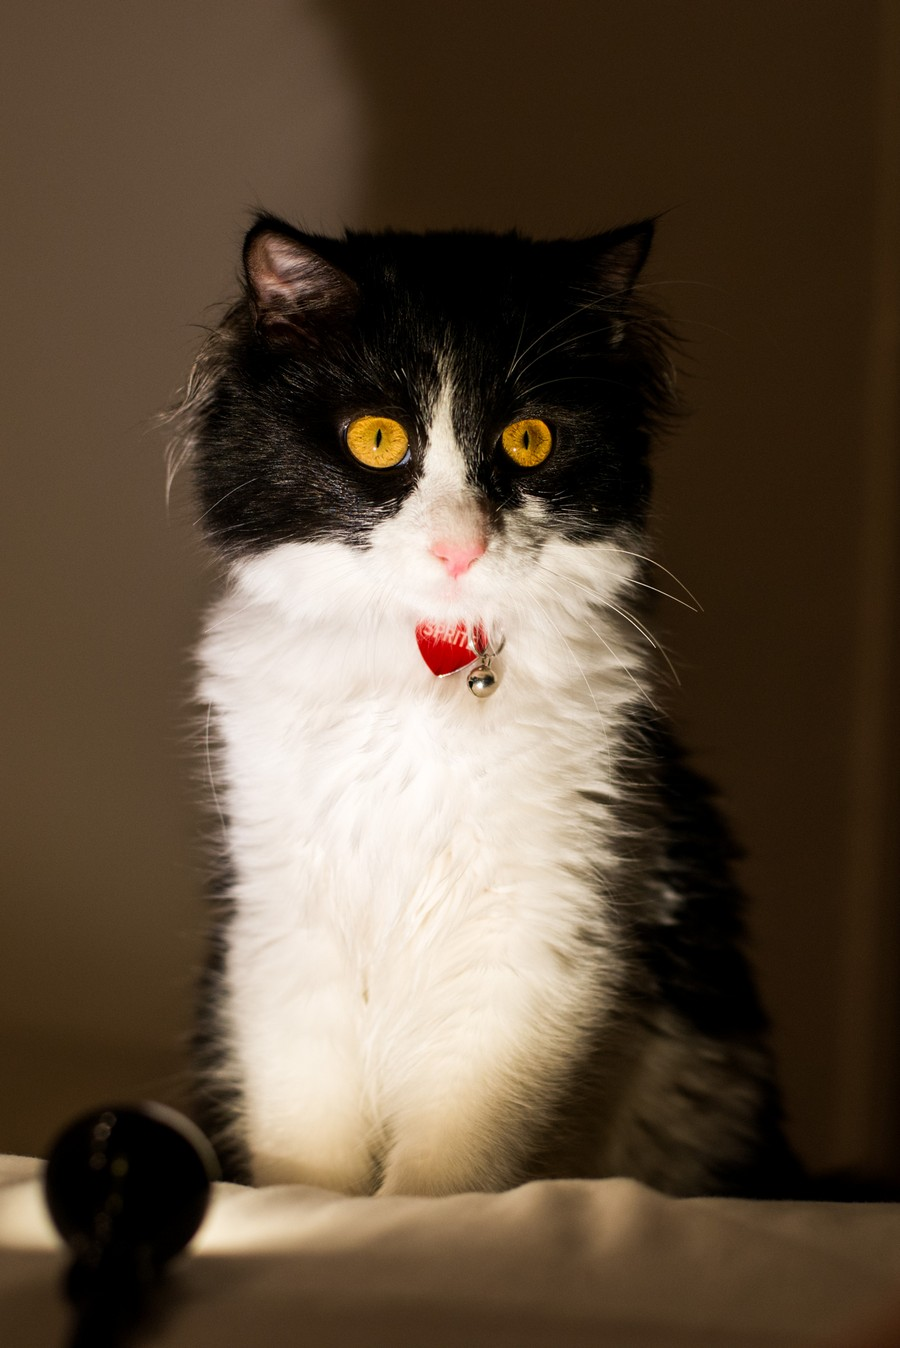 9a298434e8e4 ΣΥΜΠΕΡΙΦΟΡΑ   ΑΙΣΘΗΣΕΙΣ Αίλουρος ιατρείο για γάτες